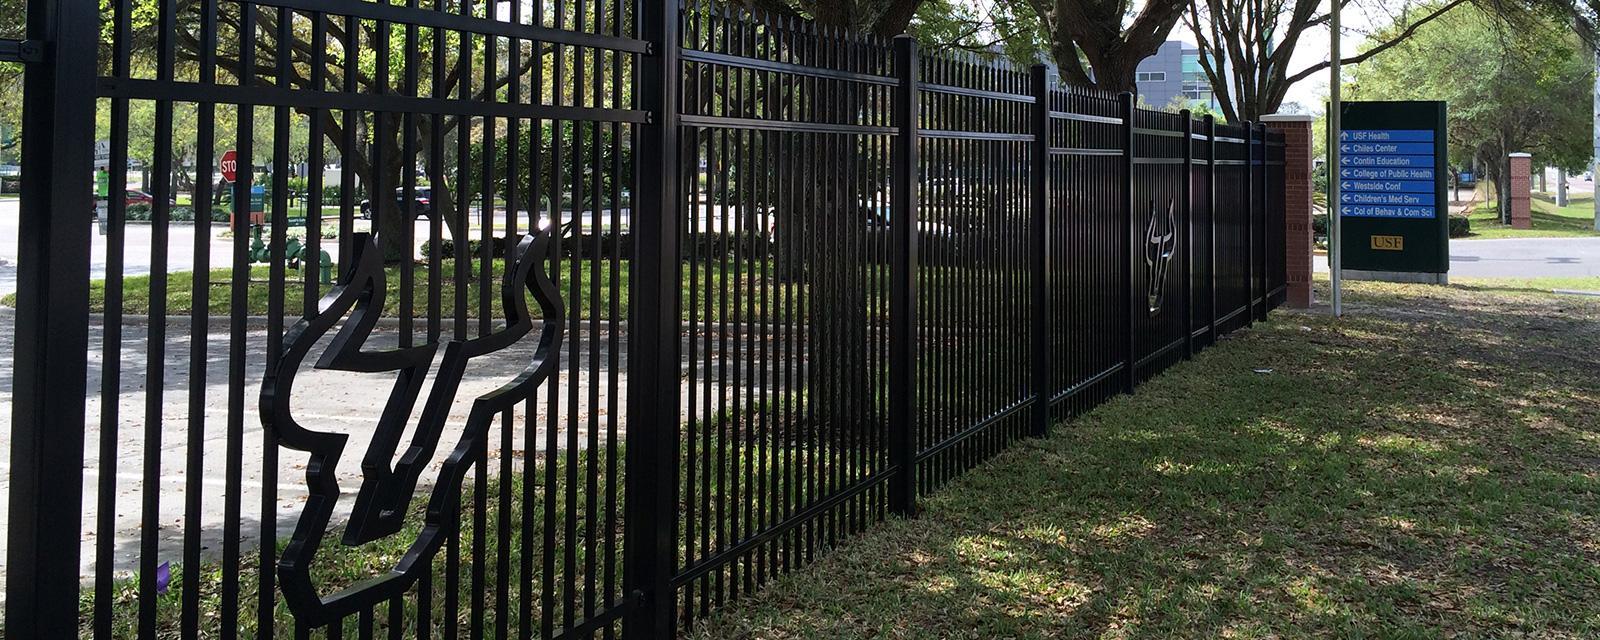 University Of South Florida Usf Campus Edge Enhancement